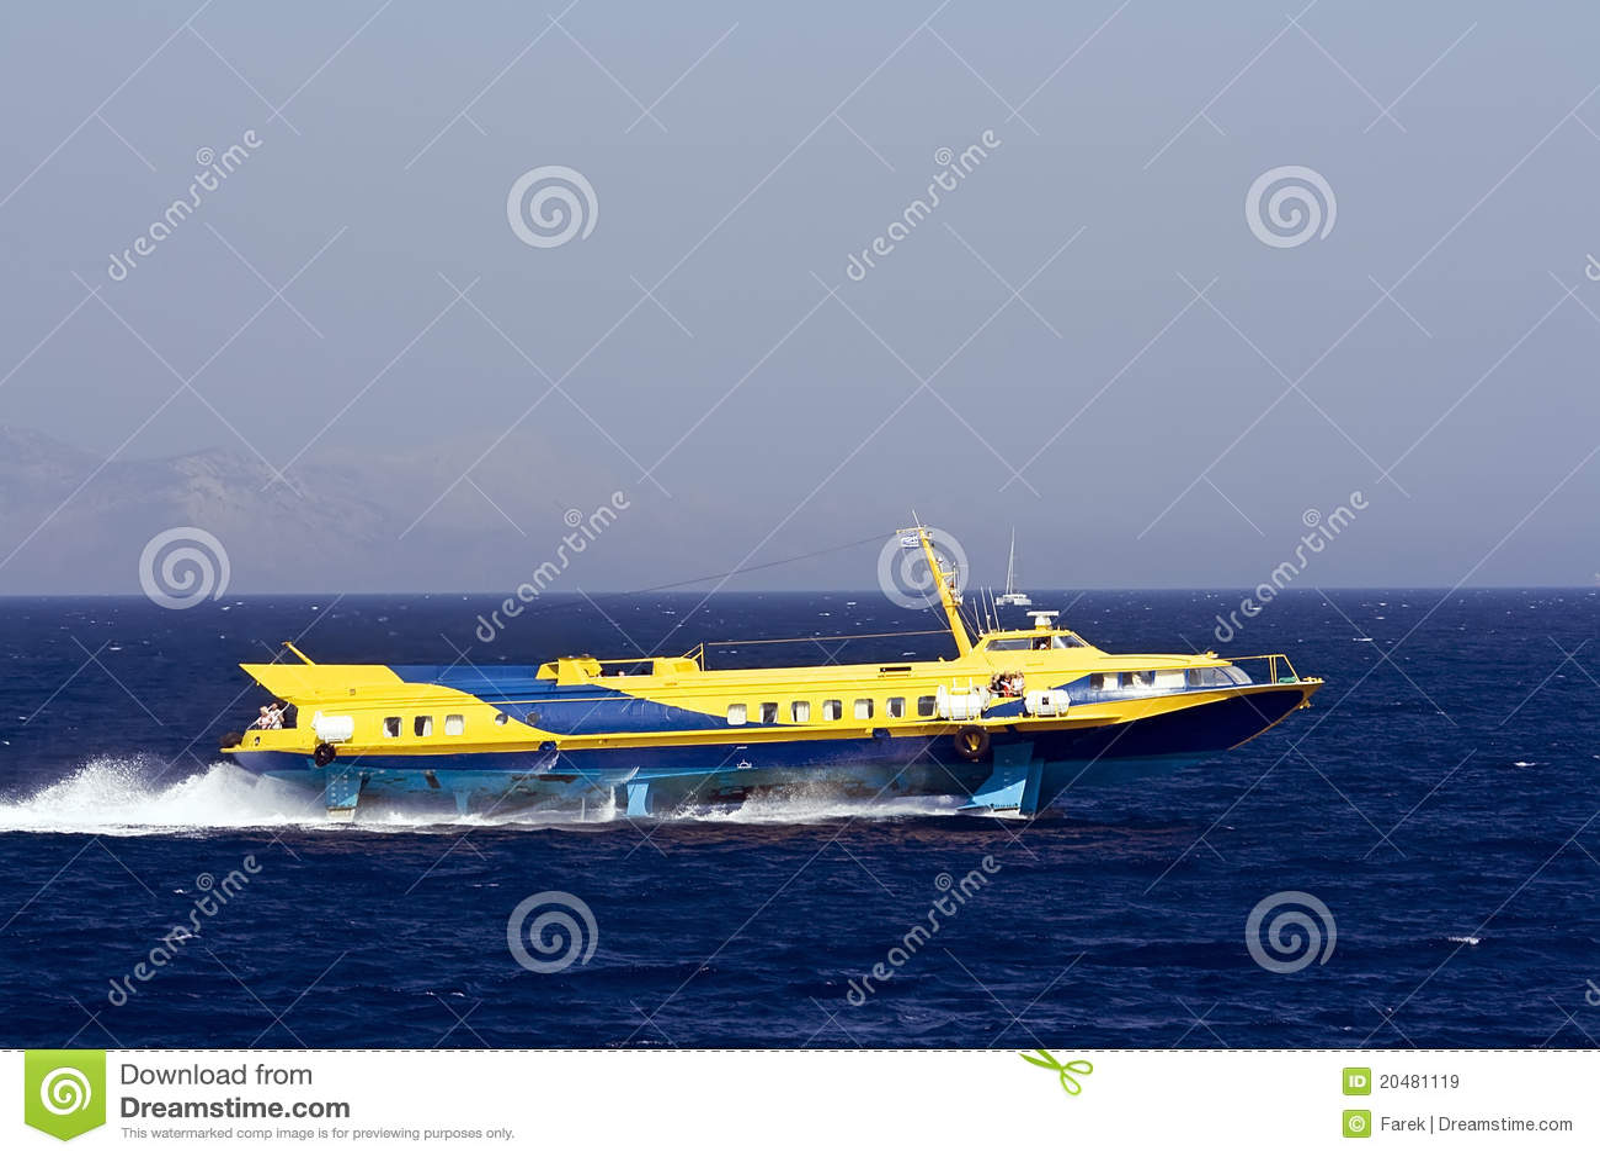 Greek hydrofoil passenger service running between the islands and ...